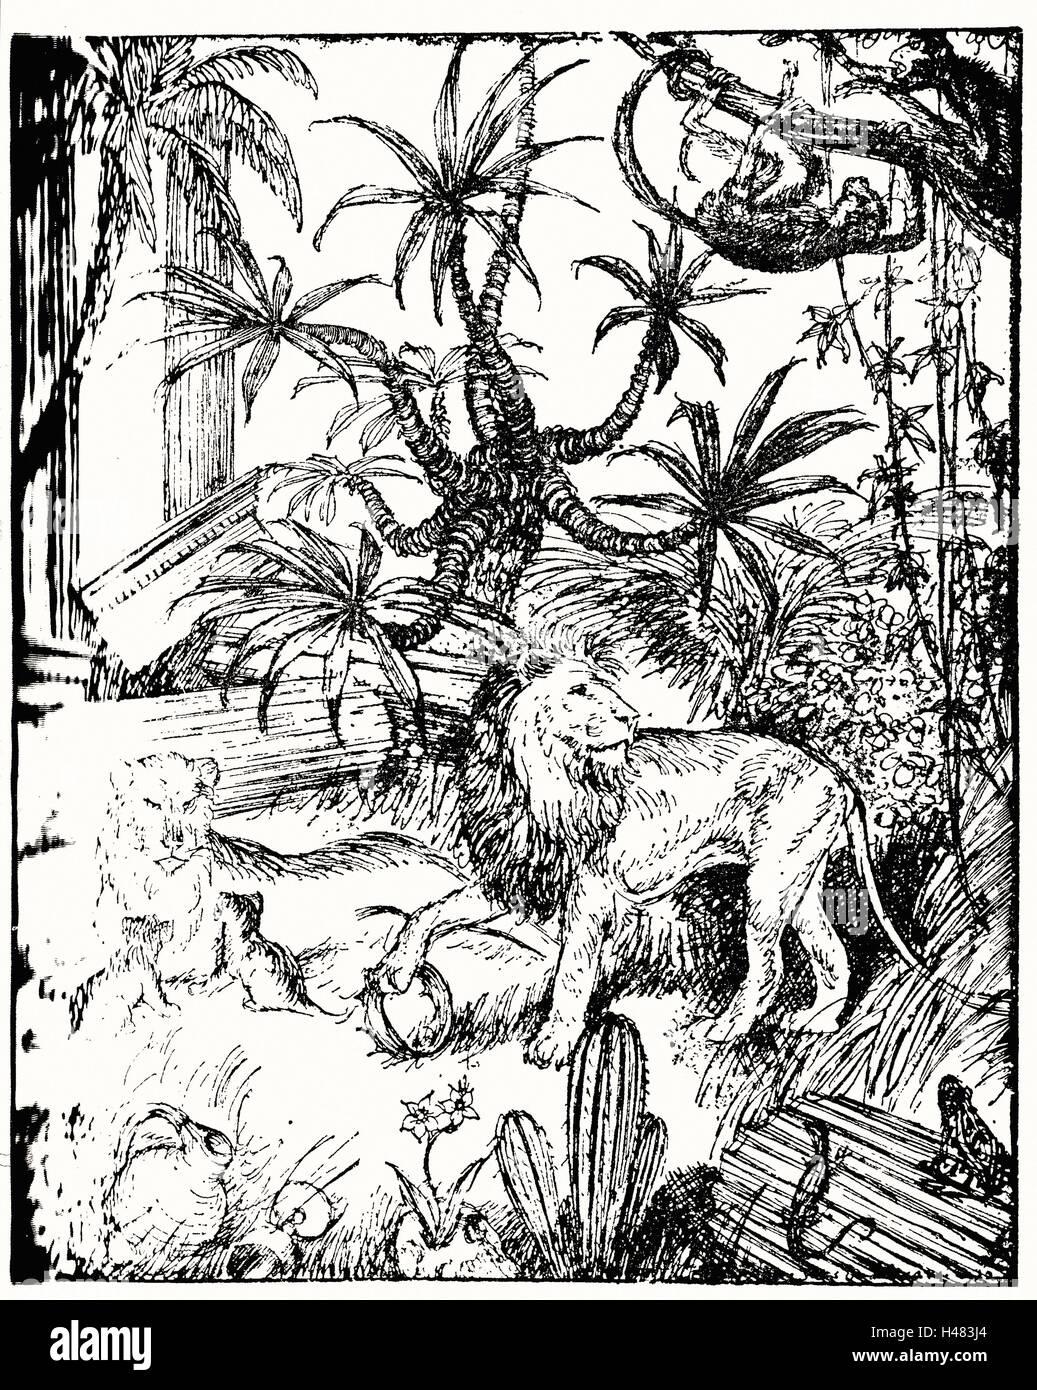 Edmund J Sullivan Illustrations pour le Rubaiyat d'Omar Khayyam Première version Quatrain Photo Stock